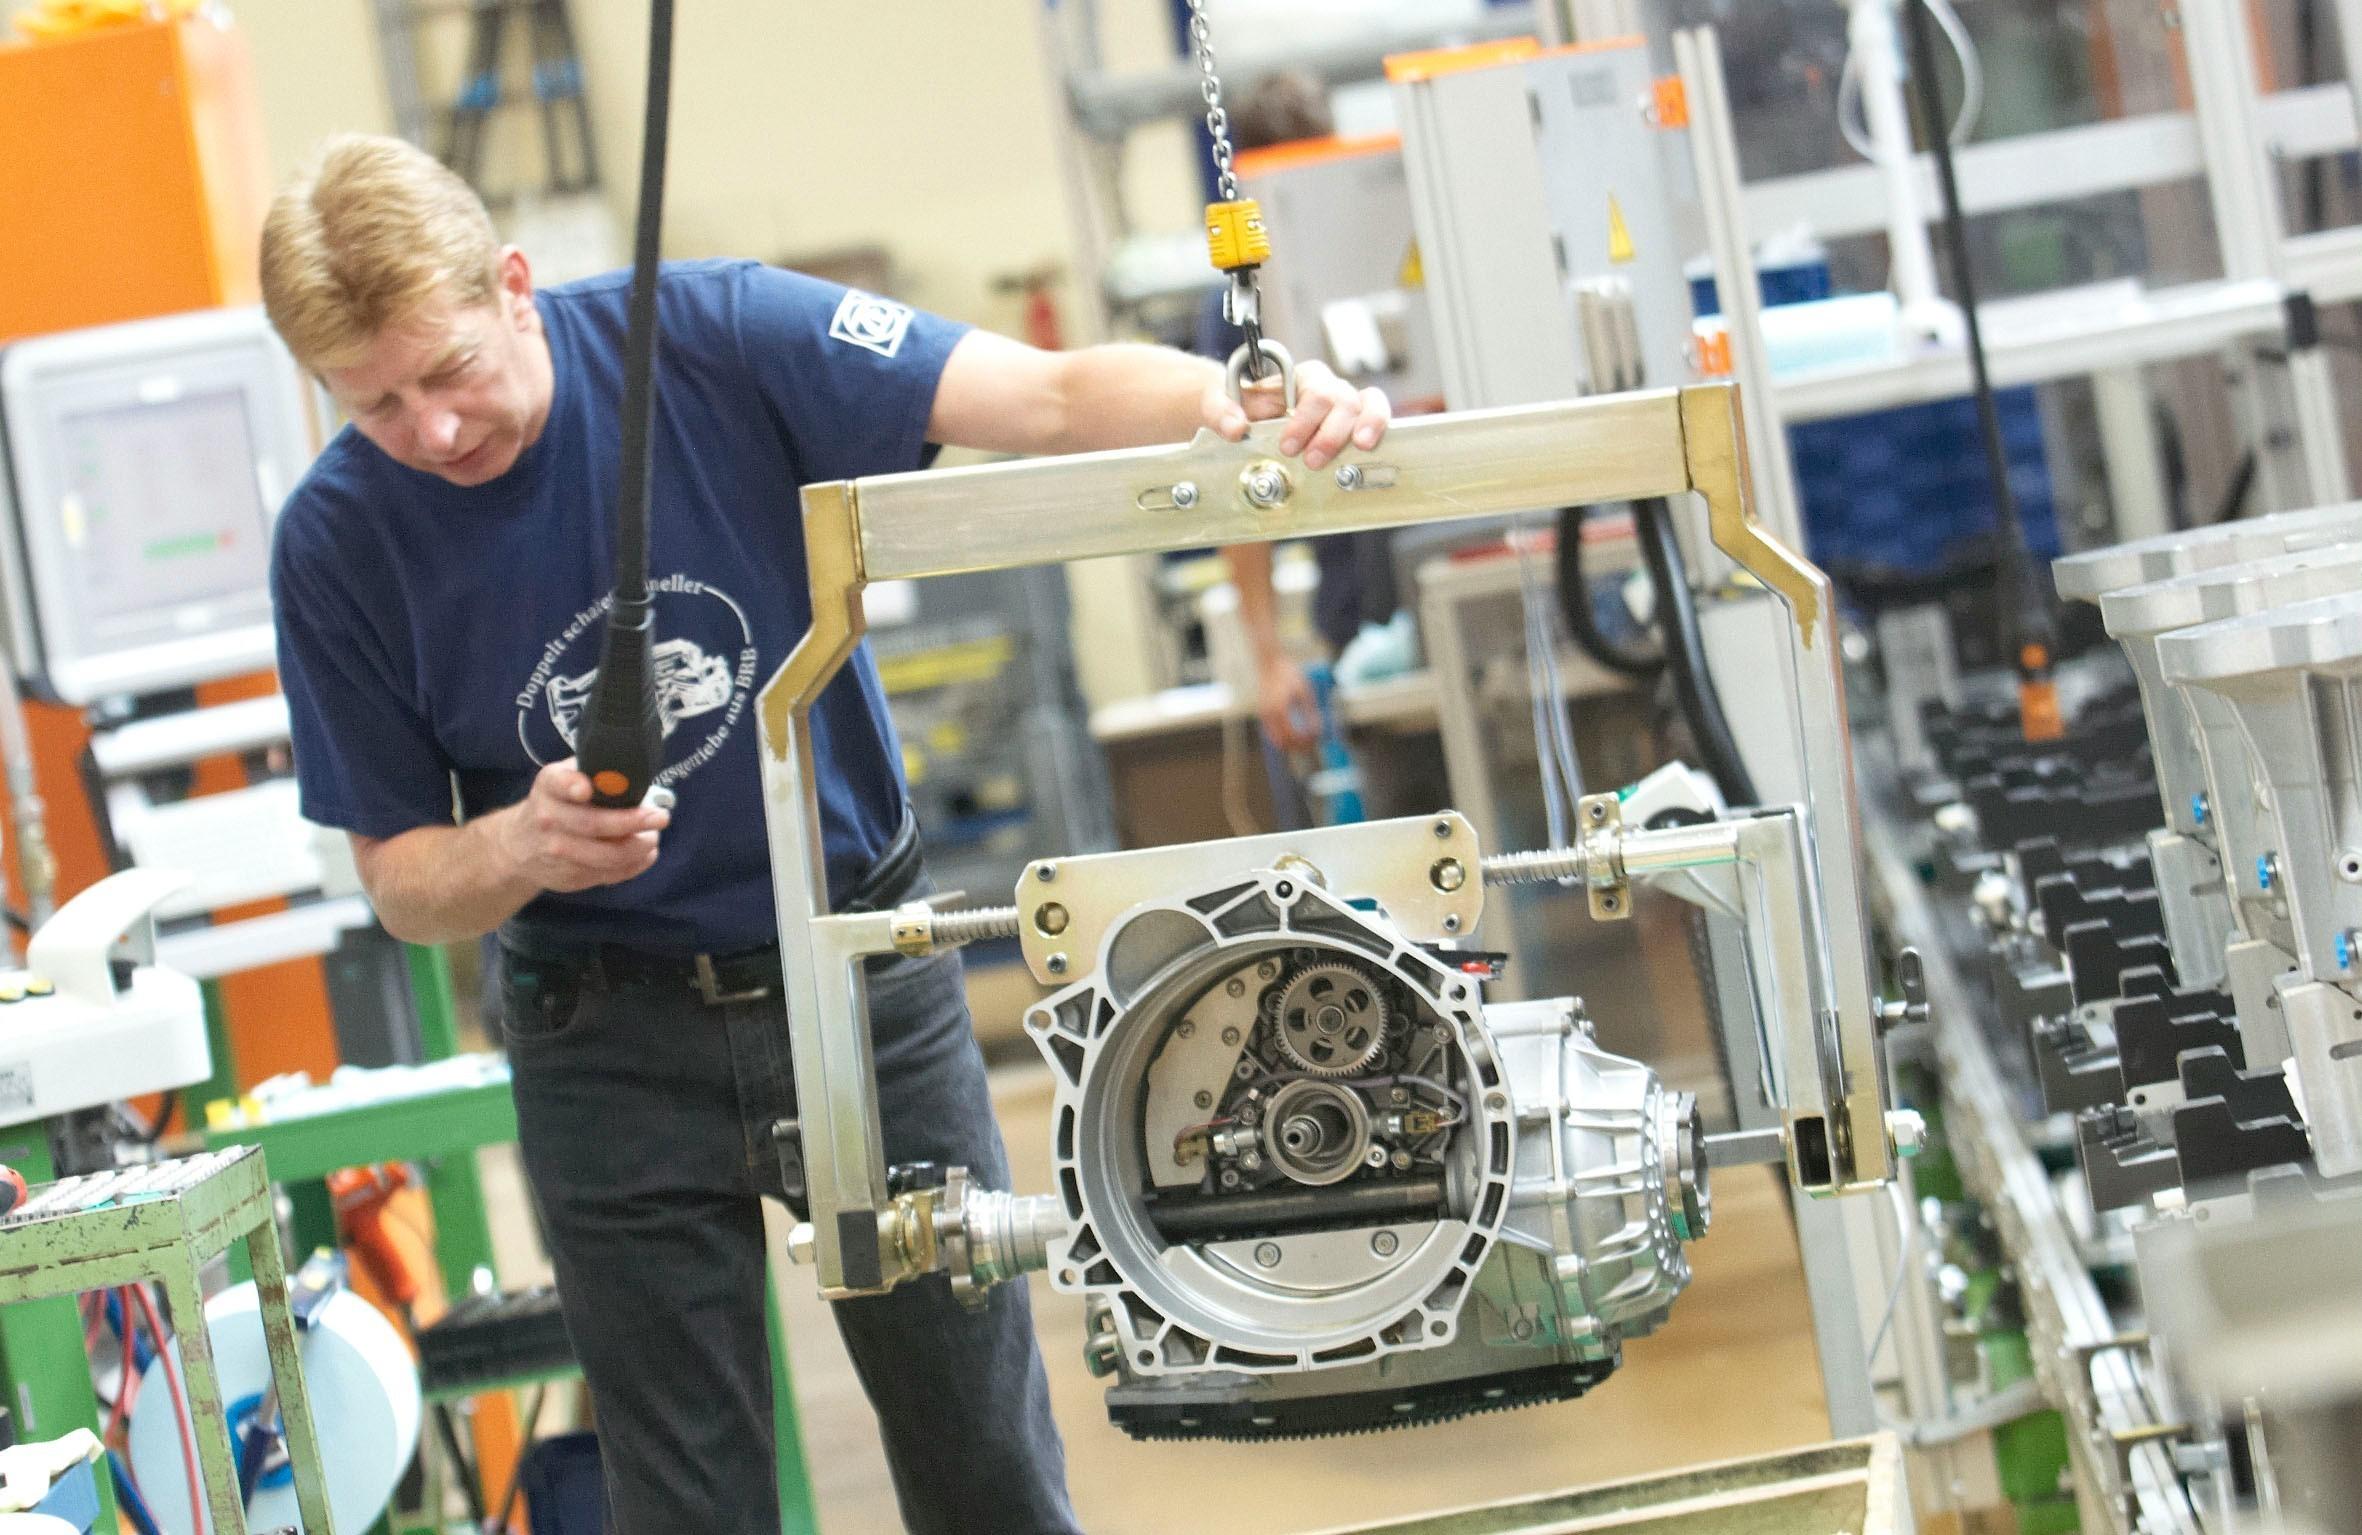 На фото: производство на заводе в Бранденбурге